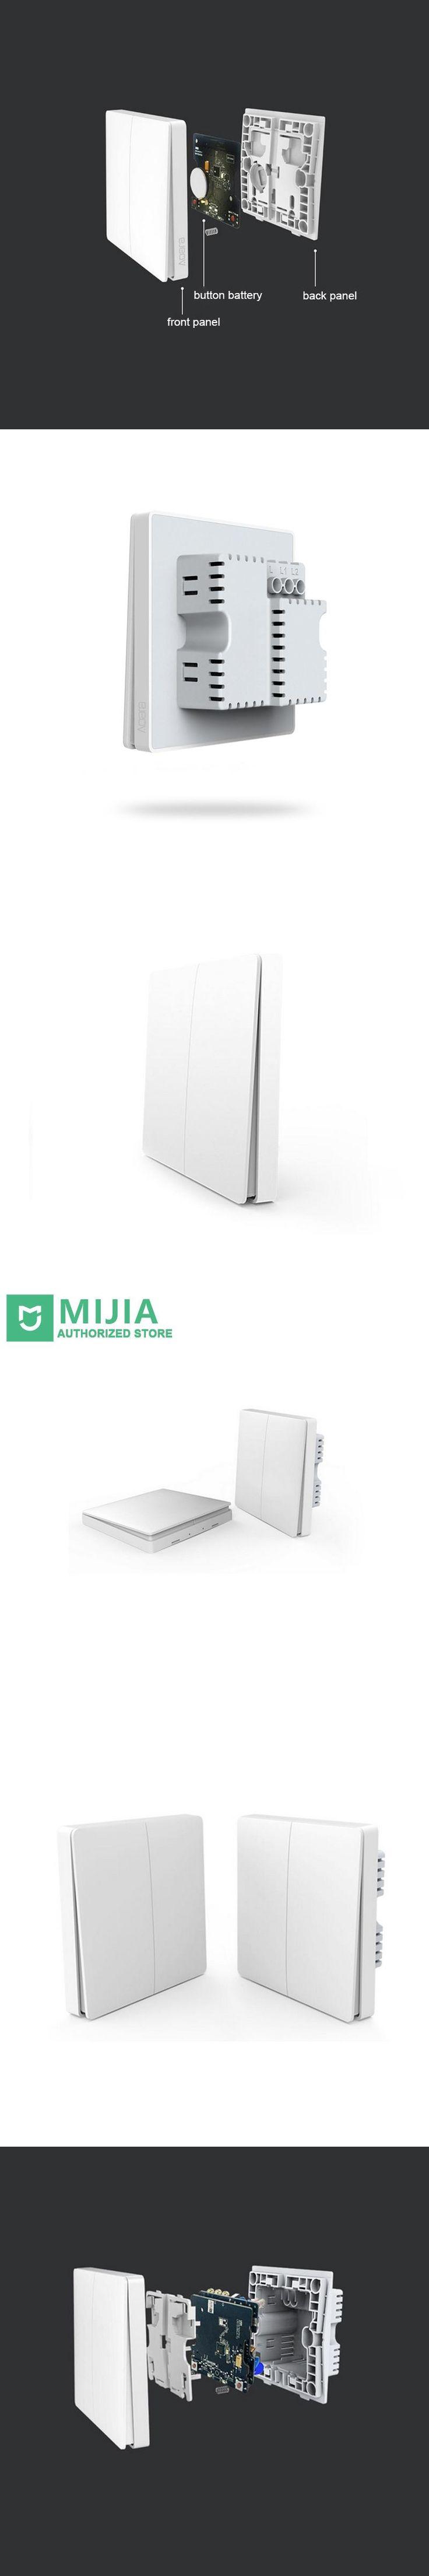 Xiaomi Aqara Smart Home Smart Light Control ZiGBee Wireless Key and Wall Switch Via Smarphone APP Remote By Mijia APP